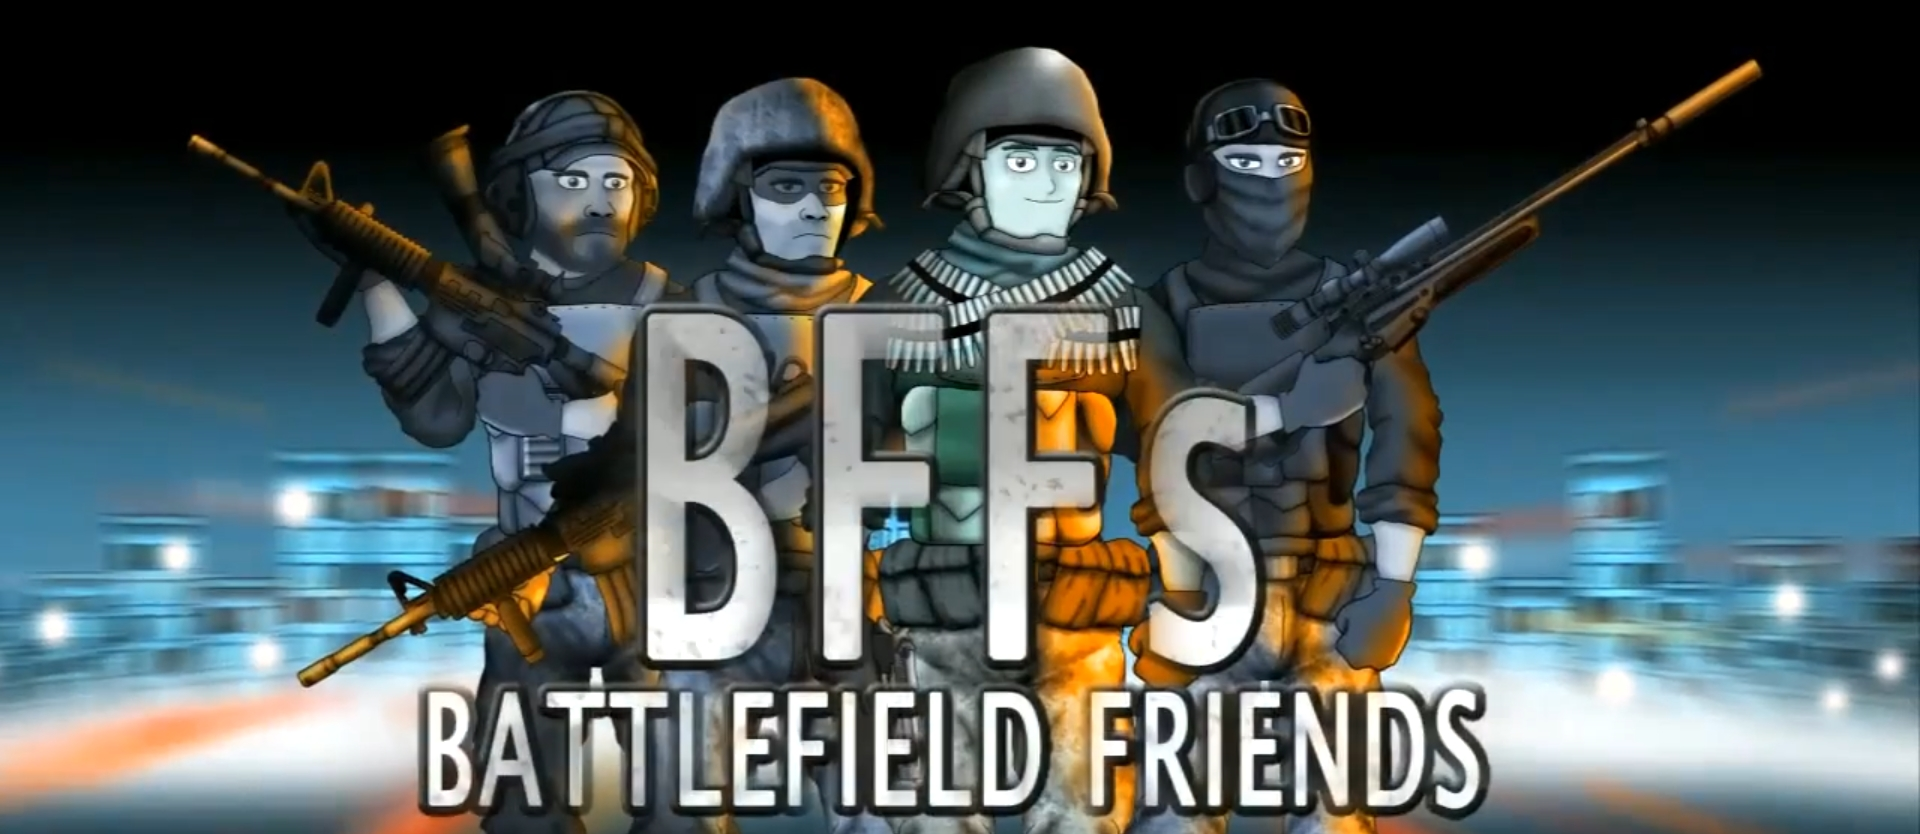 ������ �� Battlefield - �������-������ (3 �����, 12 �����)